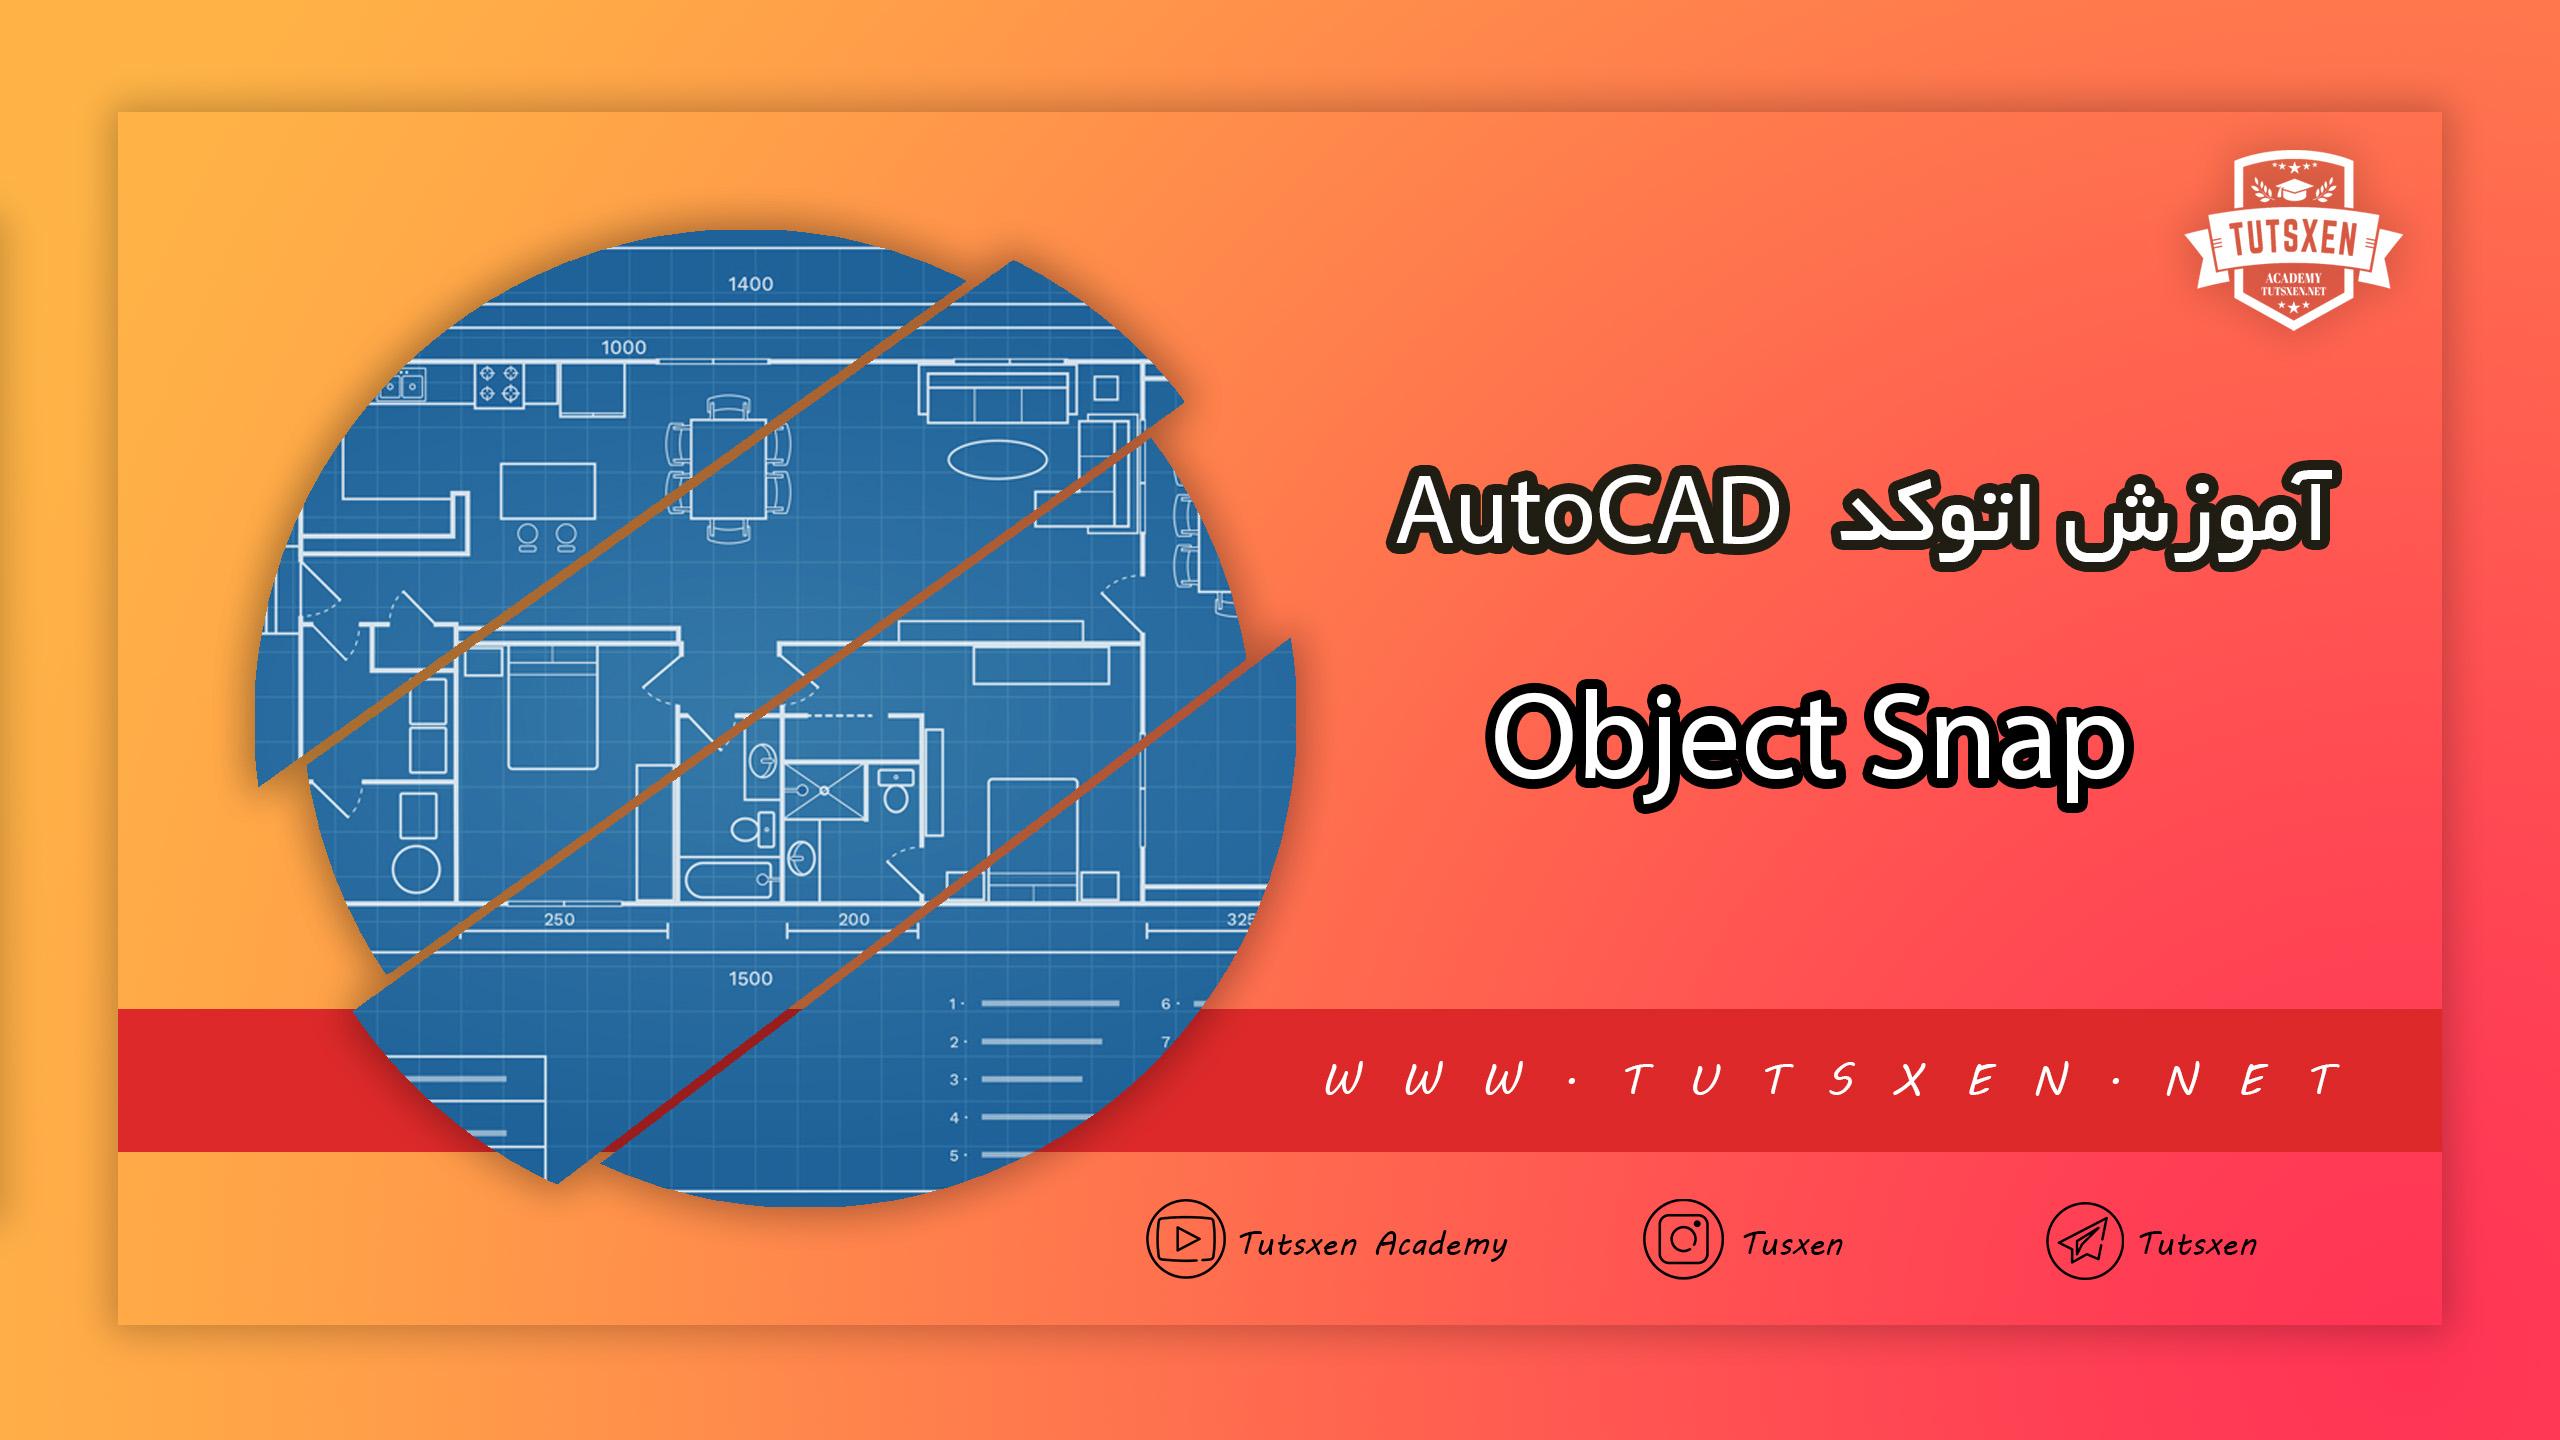 دستور object snap در اتوکد